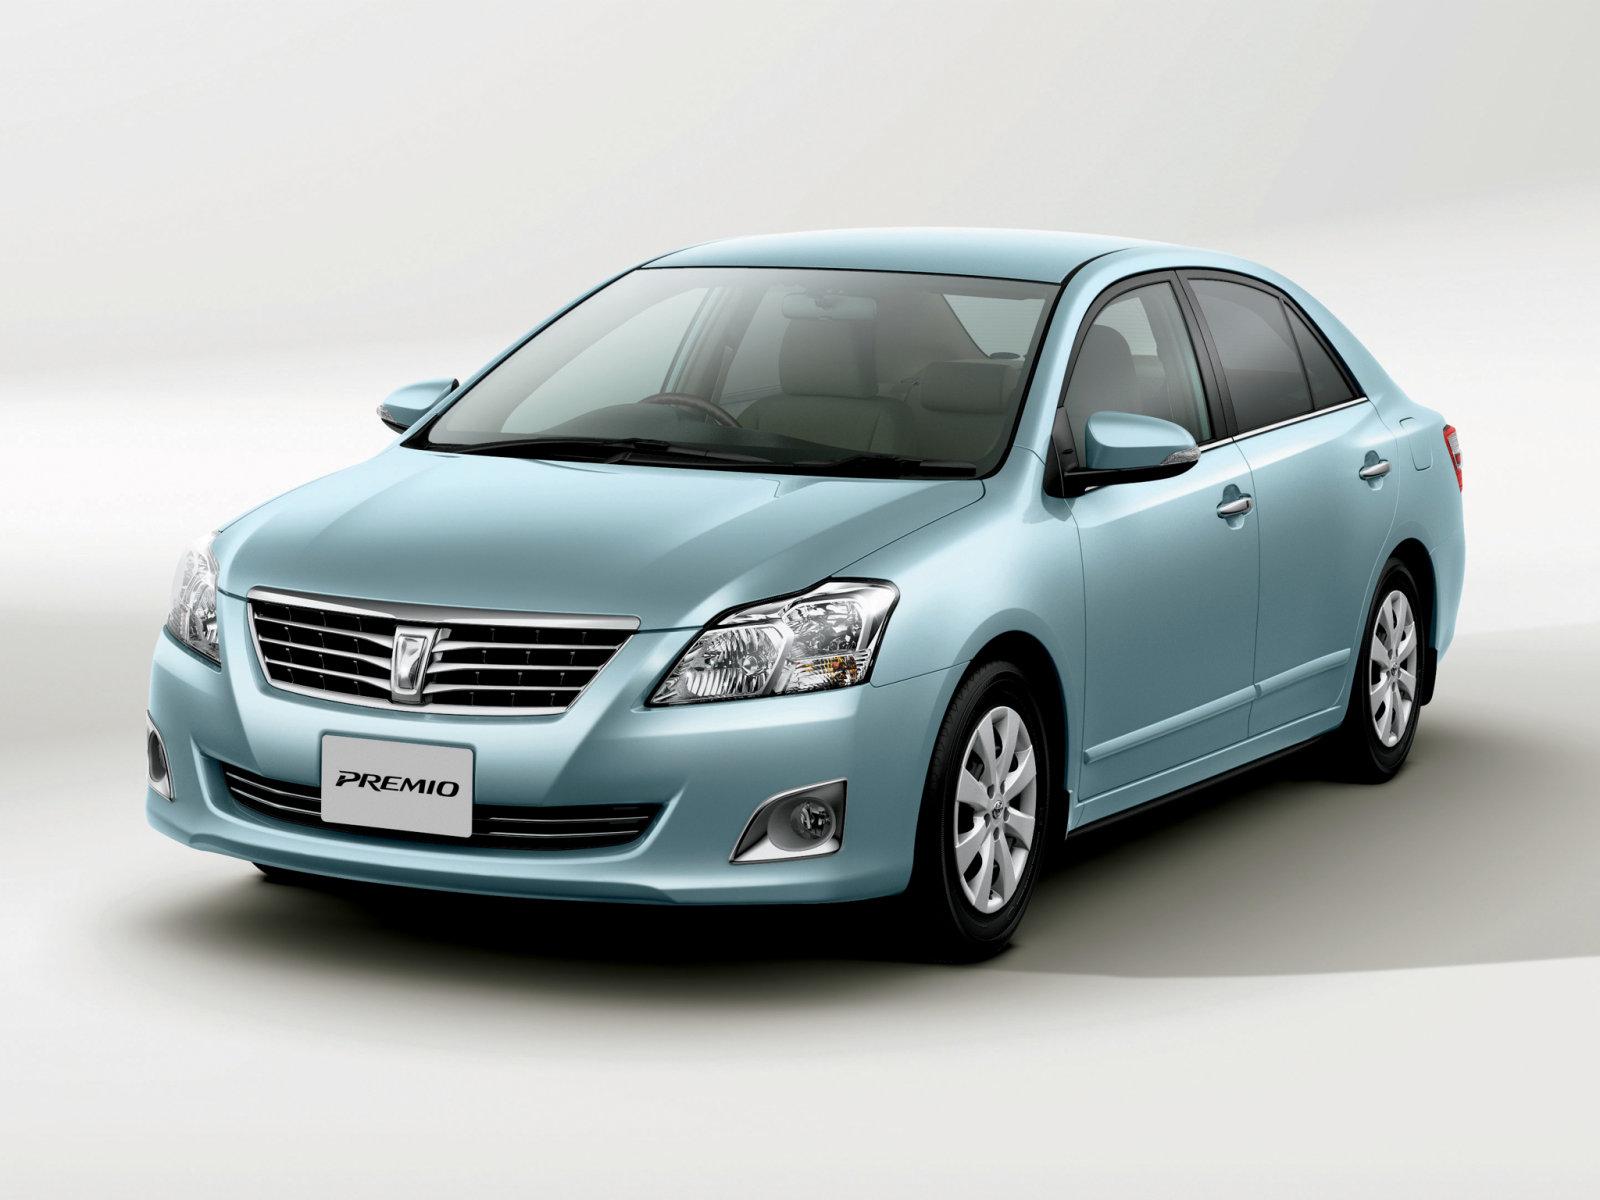 Toyota Premio photos - PhotoGallery with 4 pics| CarsBase.com